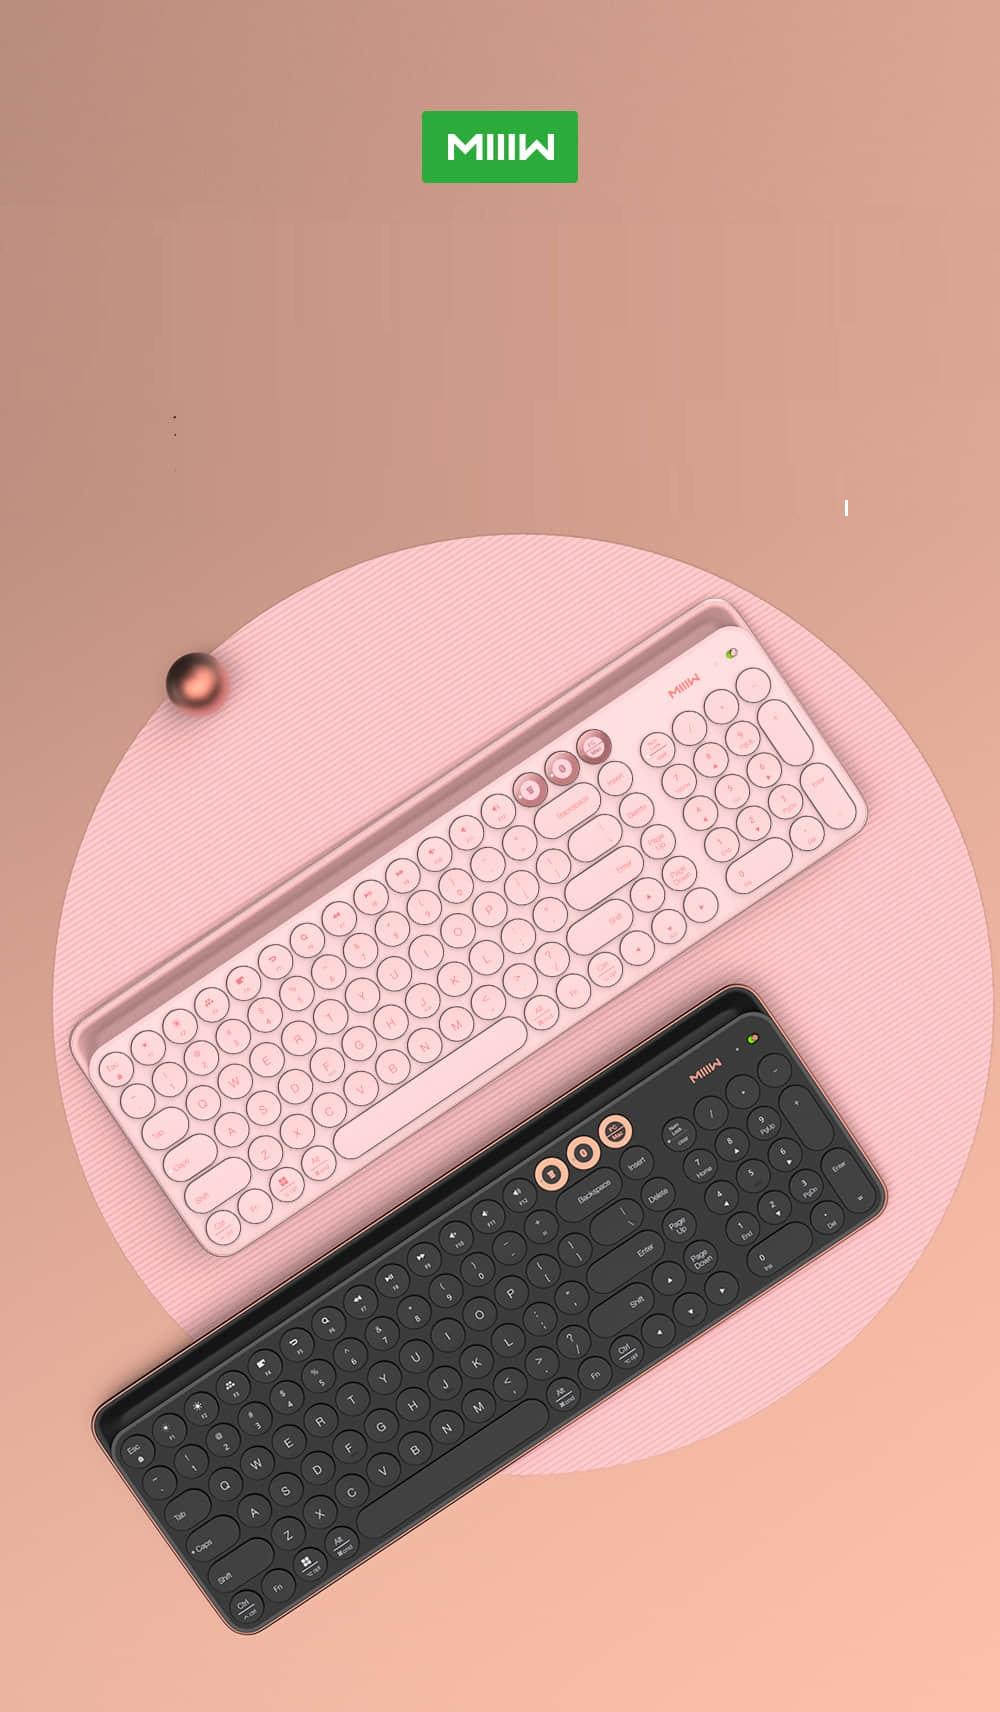 Miiiw Wireless Bluetooth Dual-mode Keyboard -Black